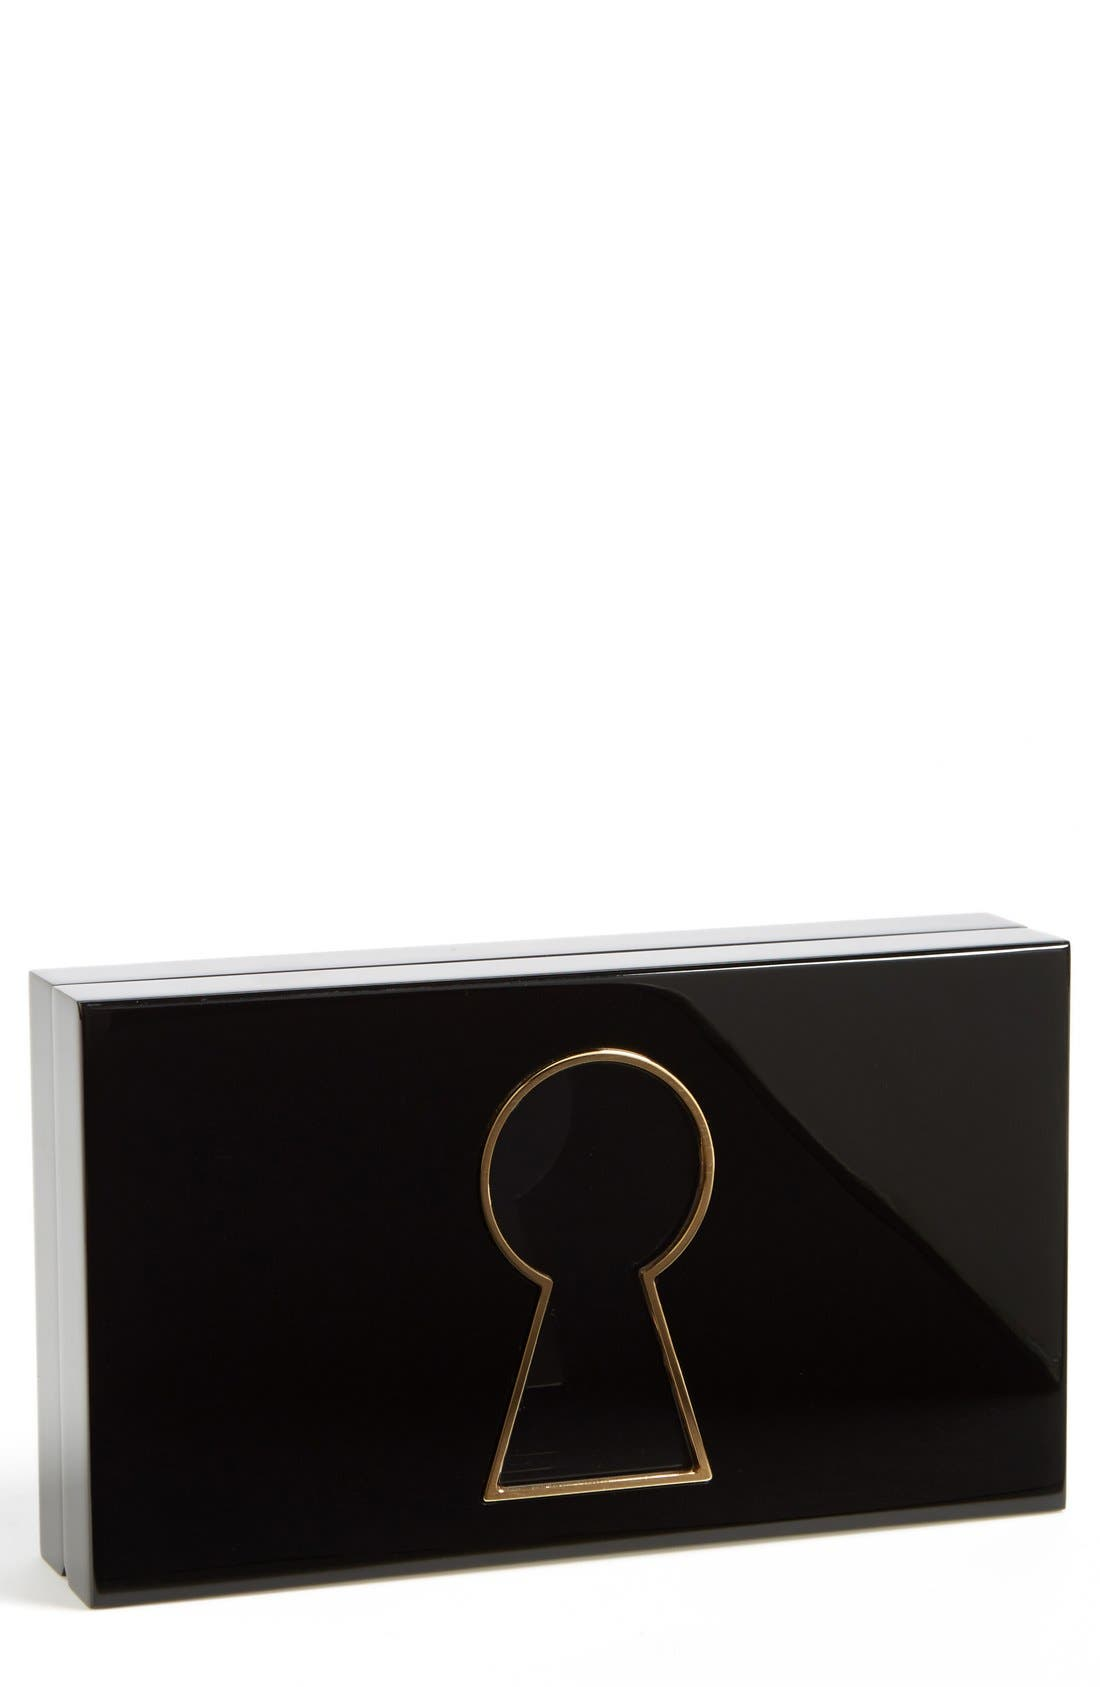 Alternate Image 1 Selected - Charlotte Olympia 'Keyhole Pandora' Clutch